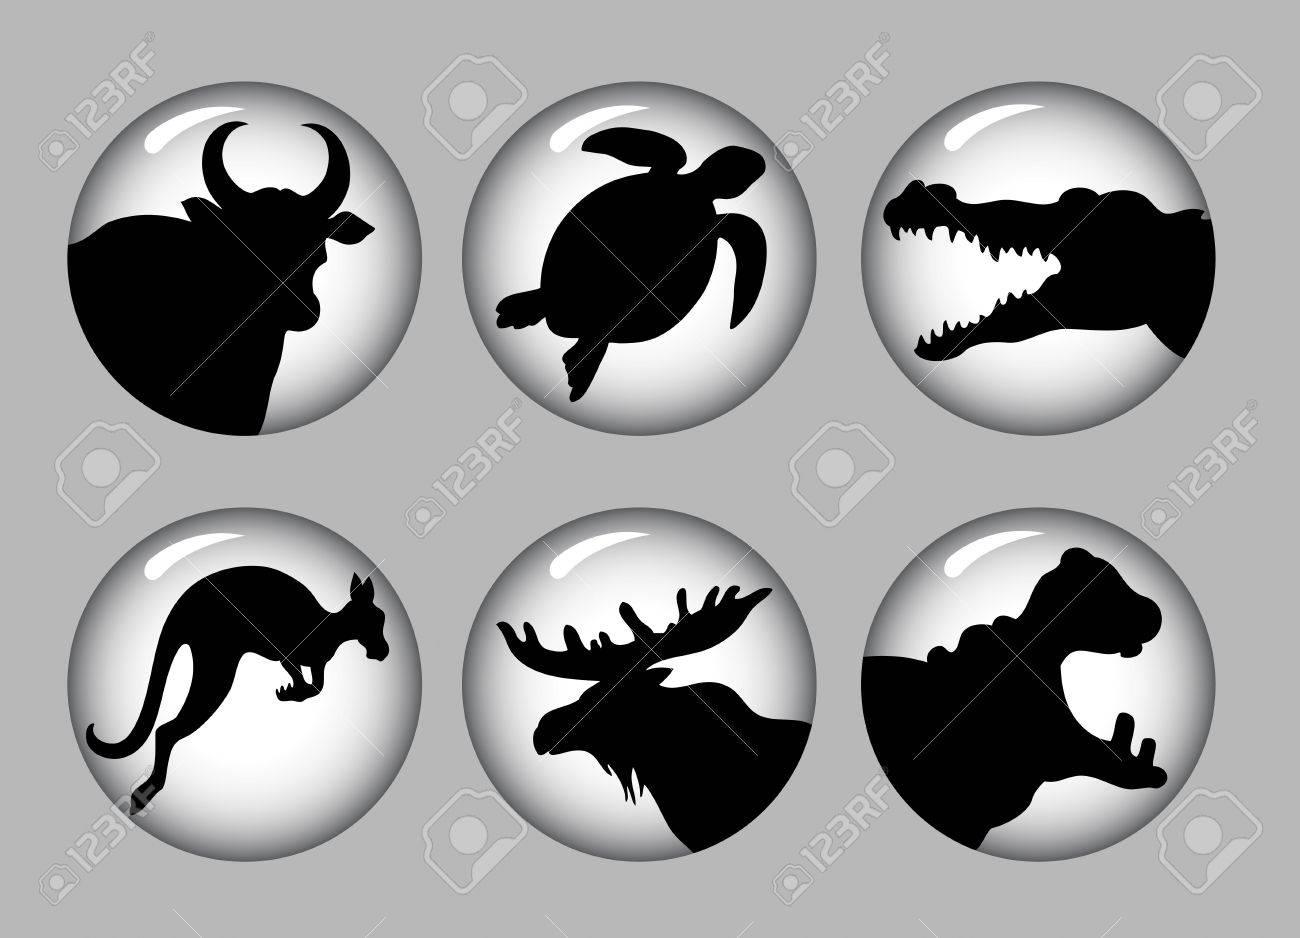 Animal Silhouette Icons black   white 2 Stock Vector - 18772440